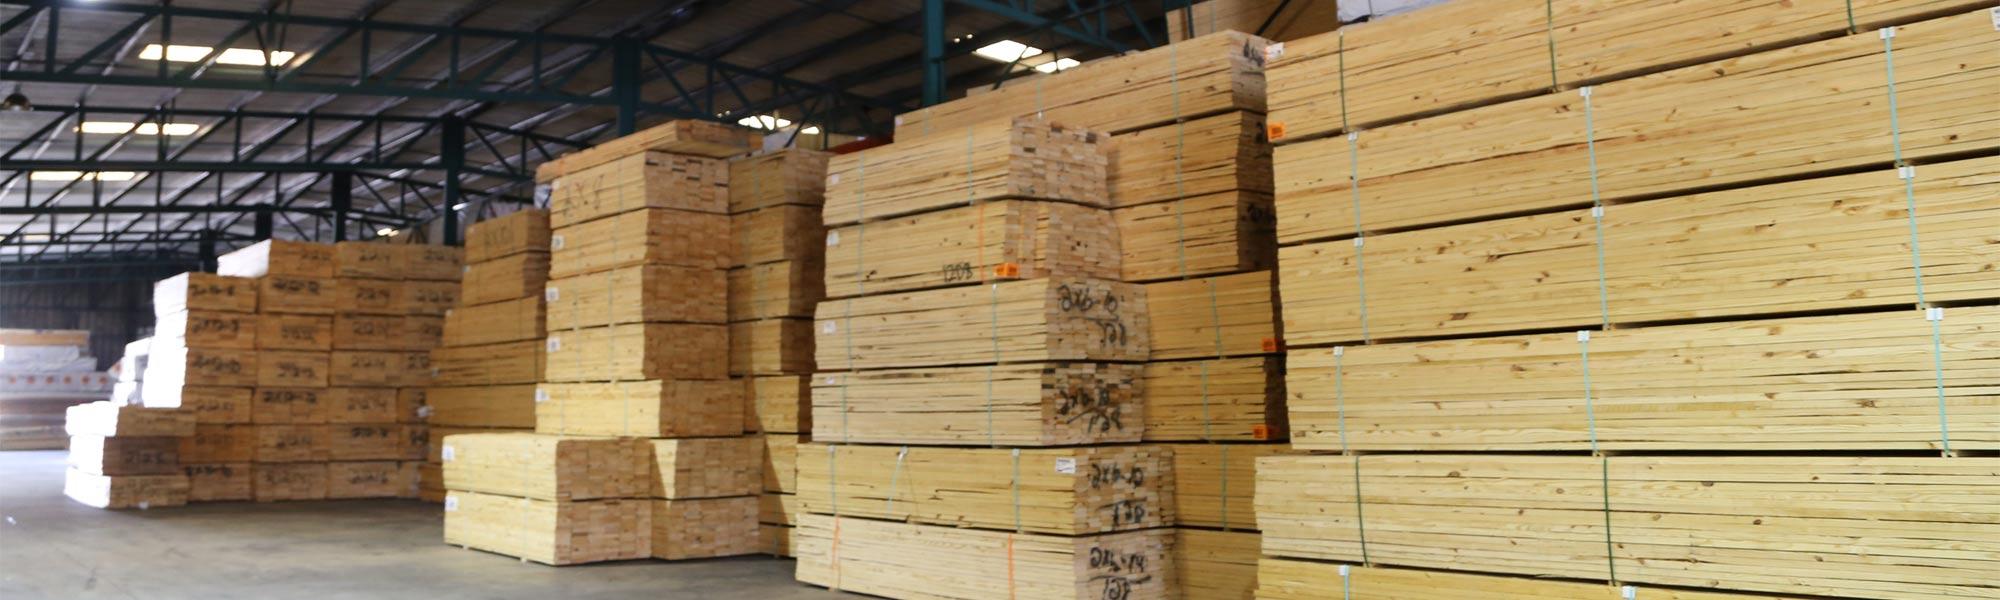 Kellett Lumbar Wood Products